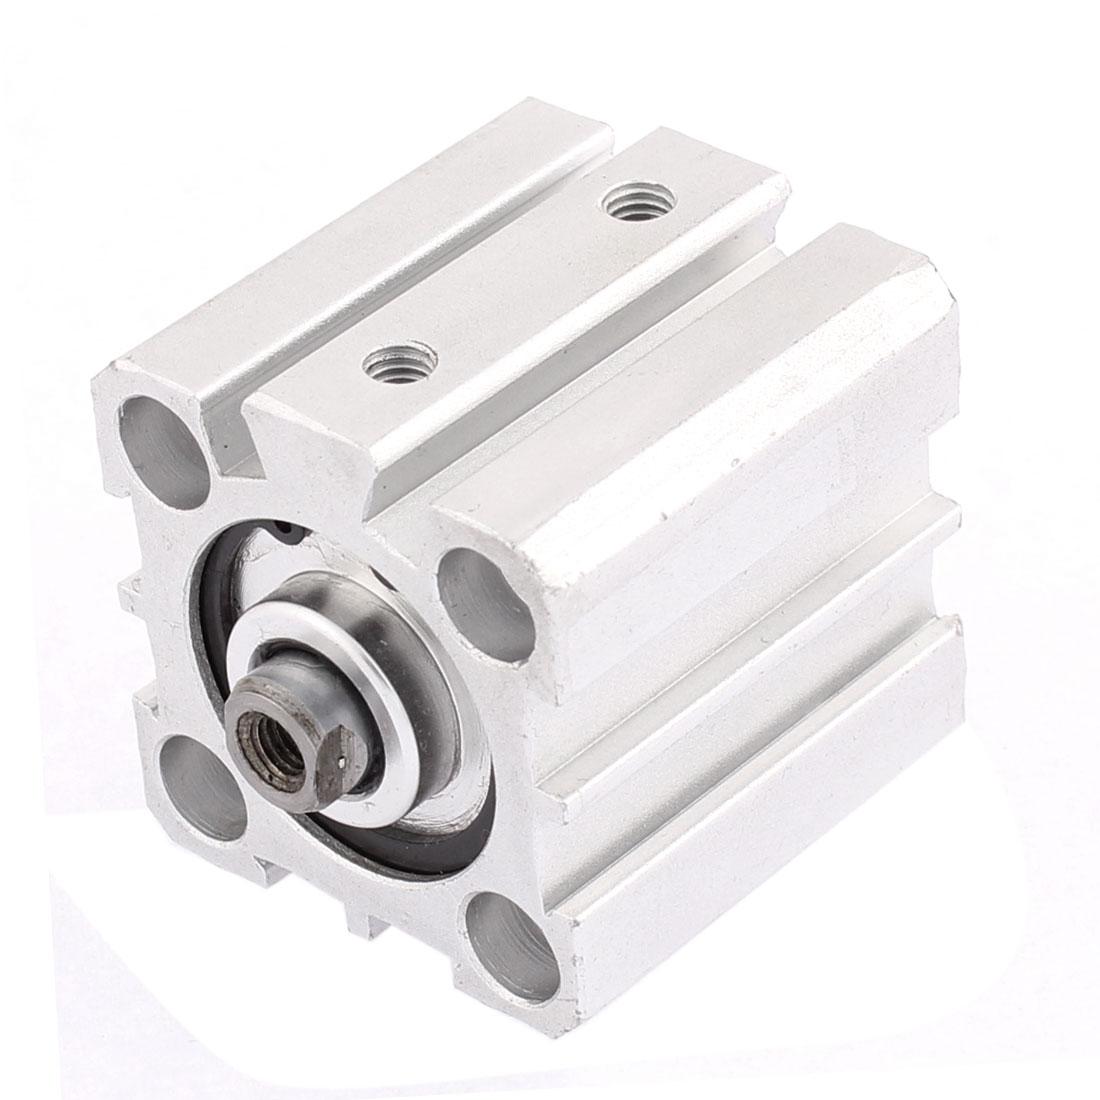 Pneumatic 25mm Bore 20mm Stroke Single Rod Aluminum Alloy Air Cylinder